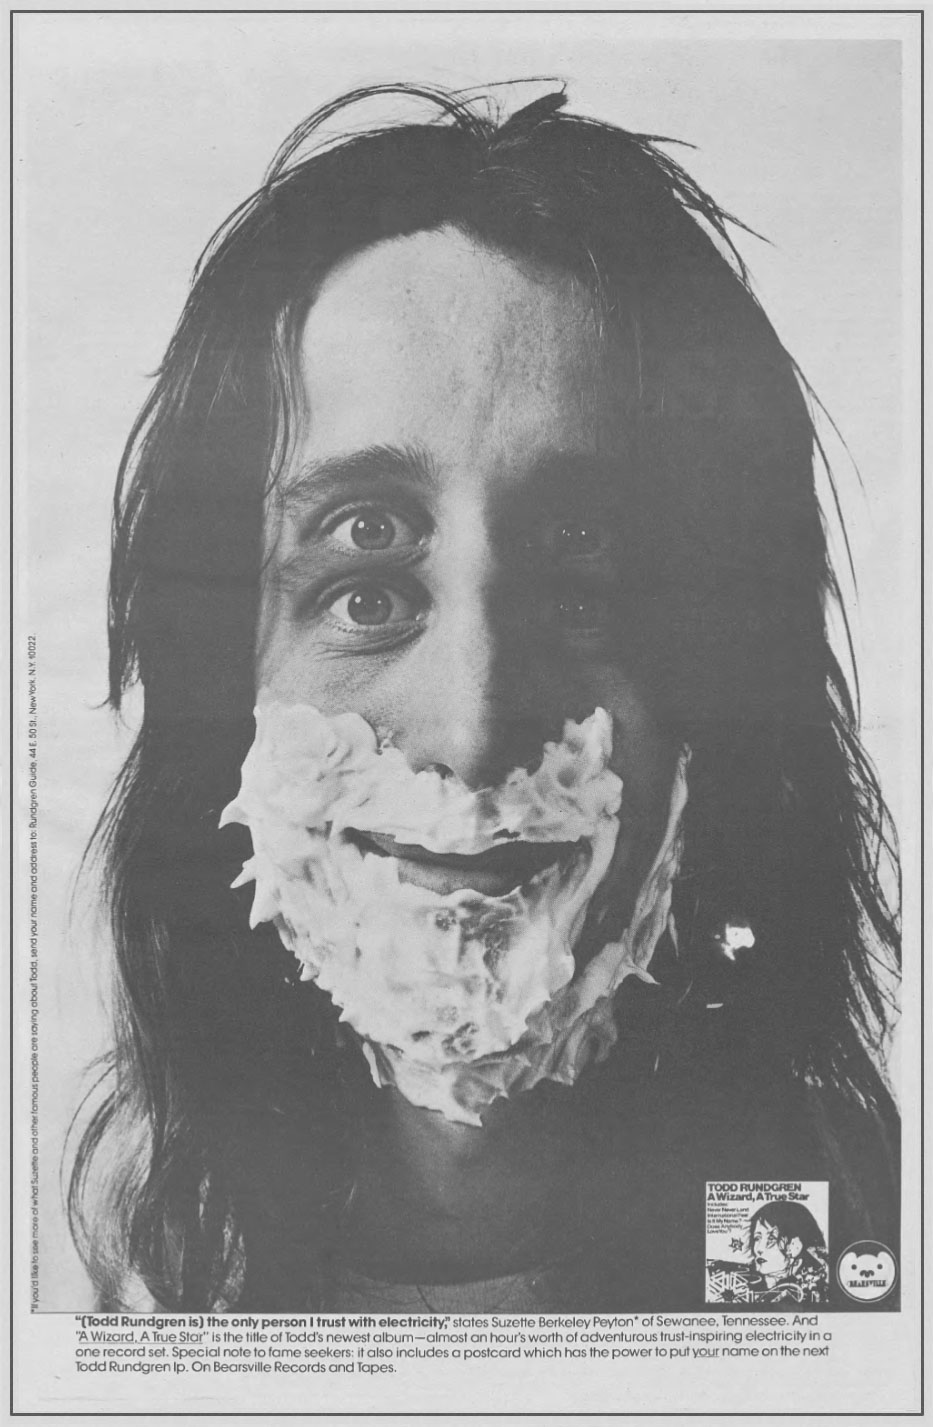 E A Wizard/A True Star, de Todd Rundgren, fez 45 anos em 2018